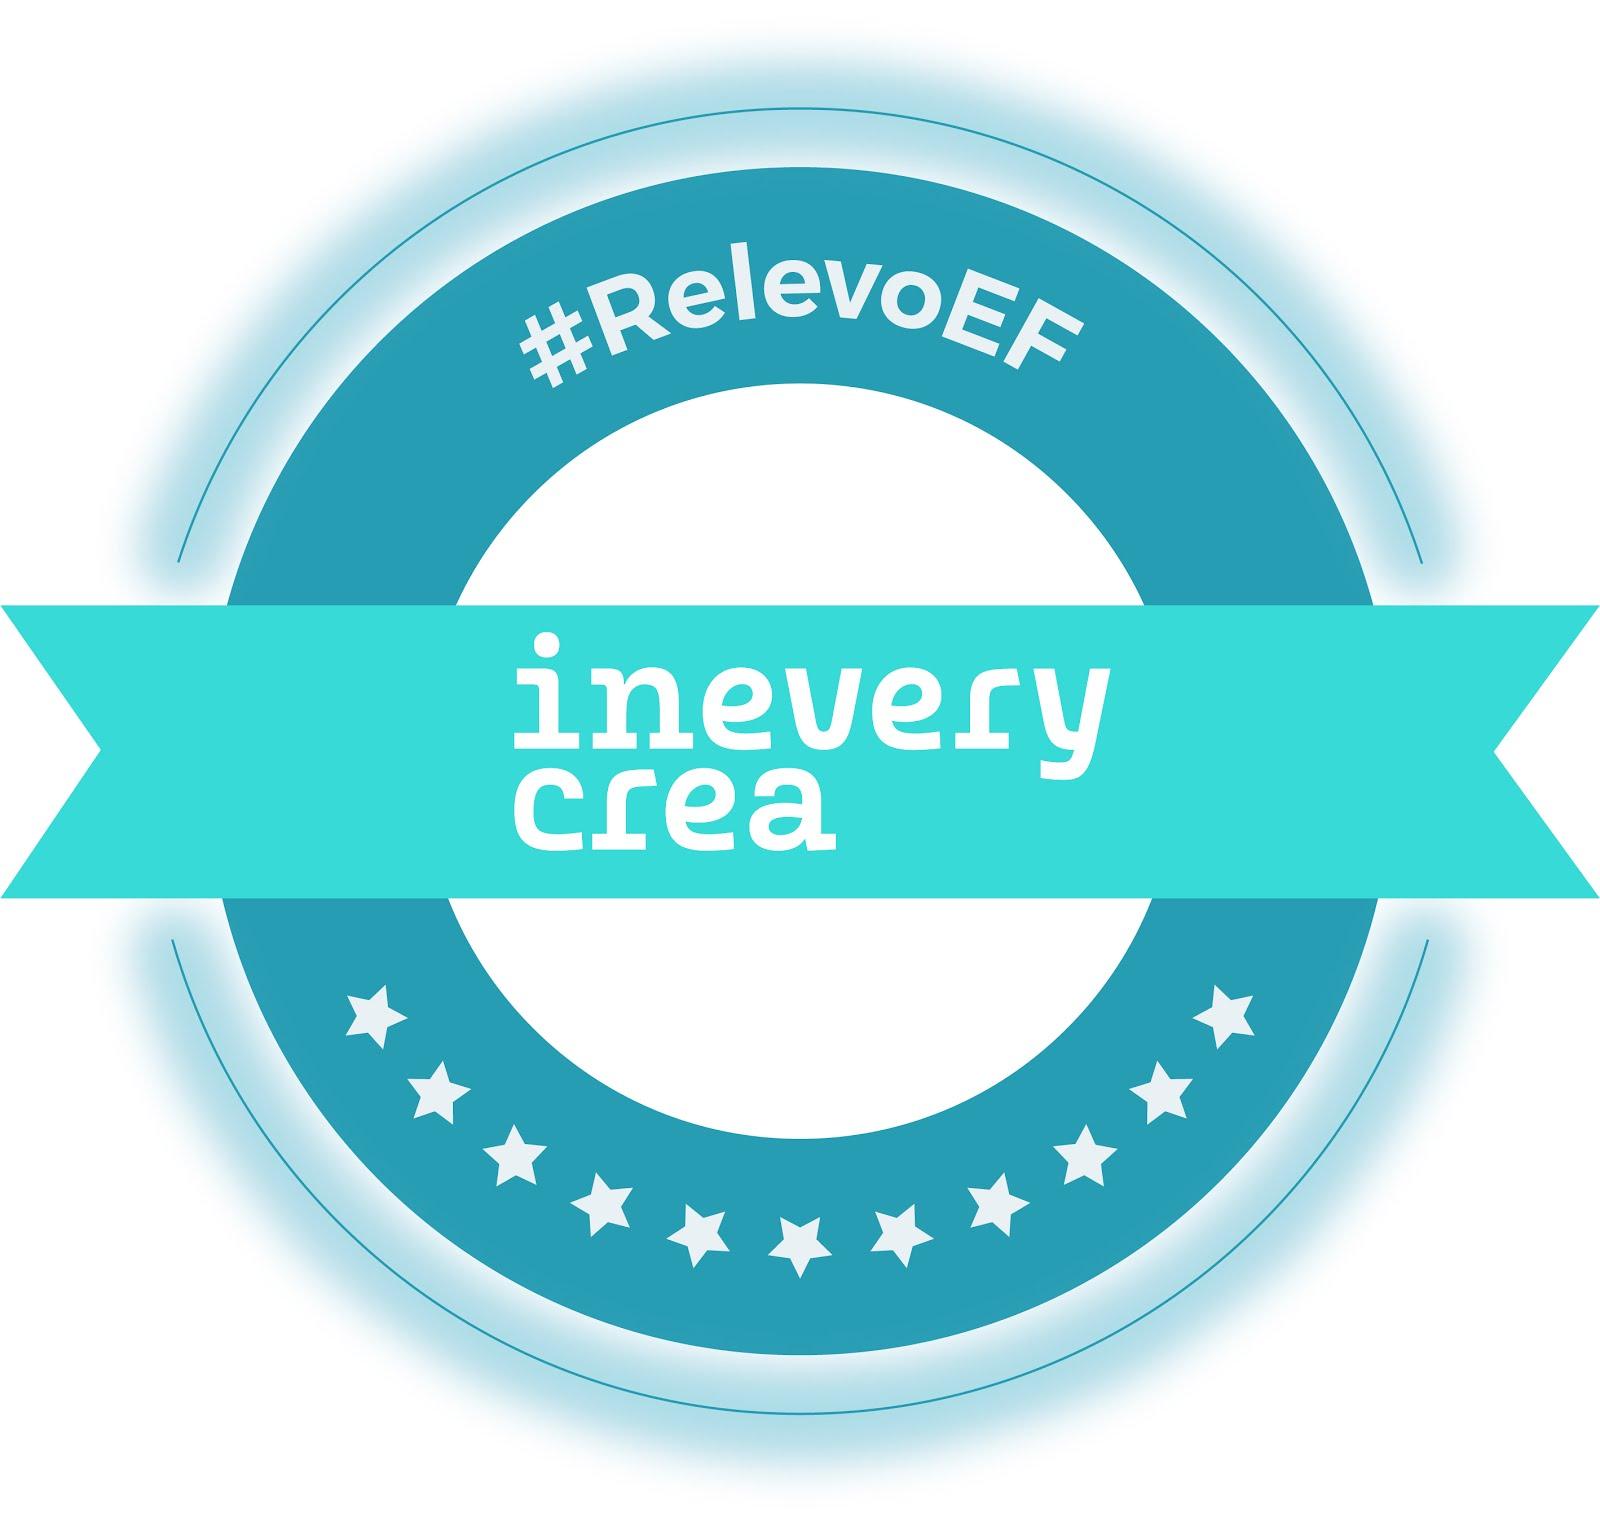 Proyecto #RelevoEF